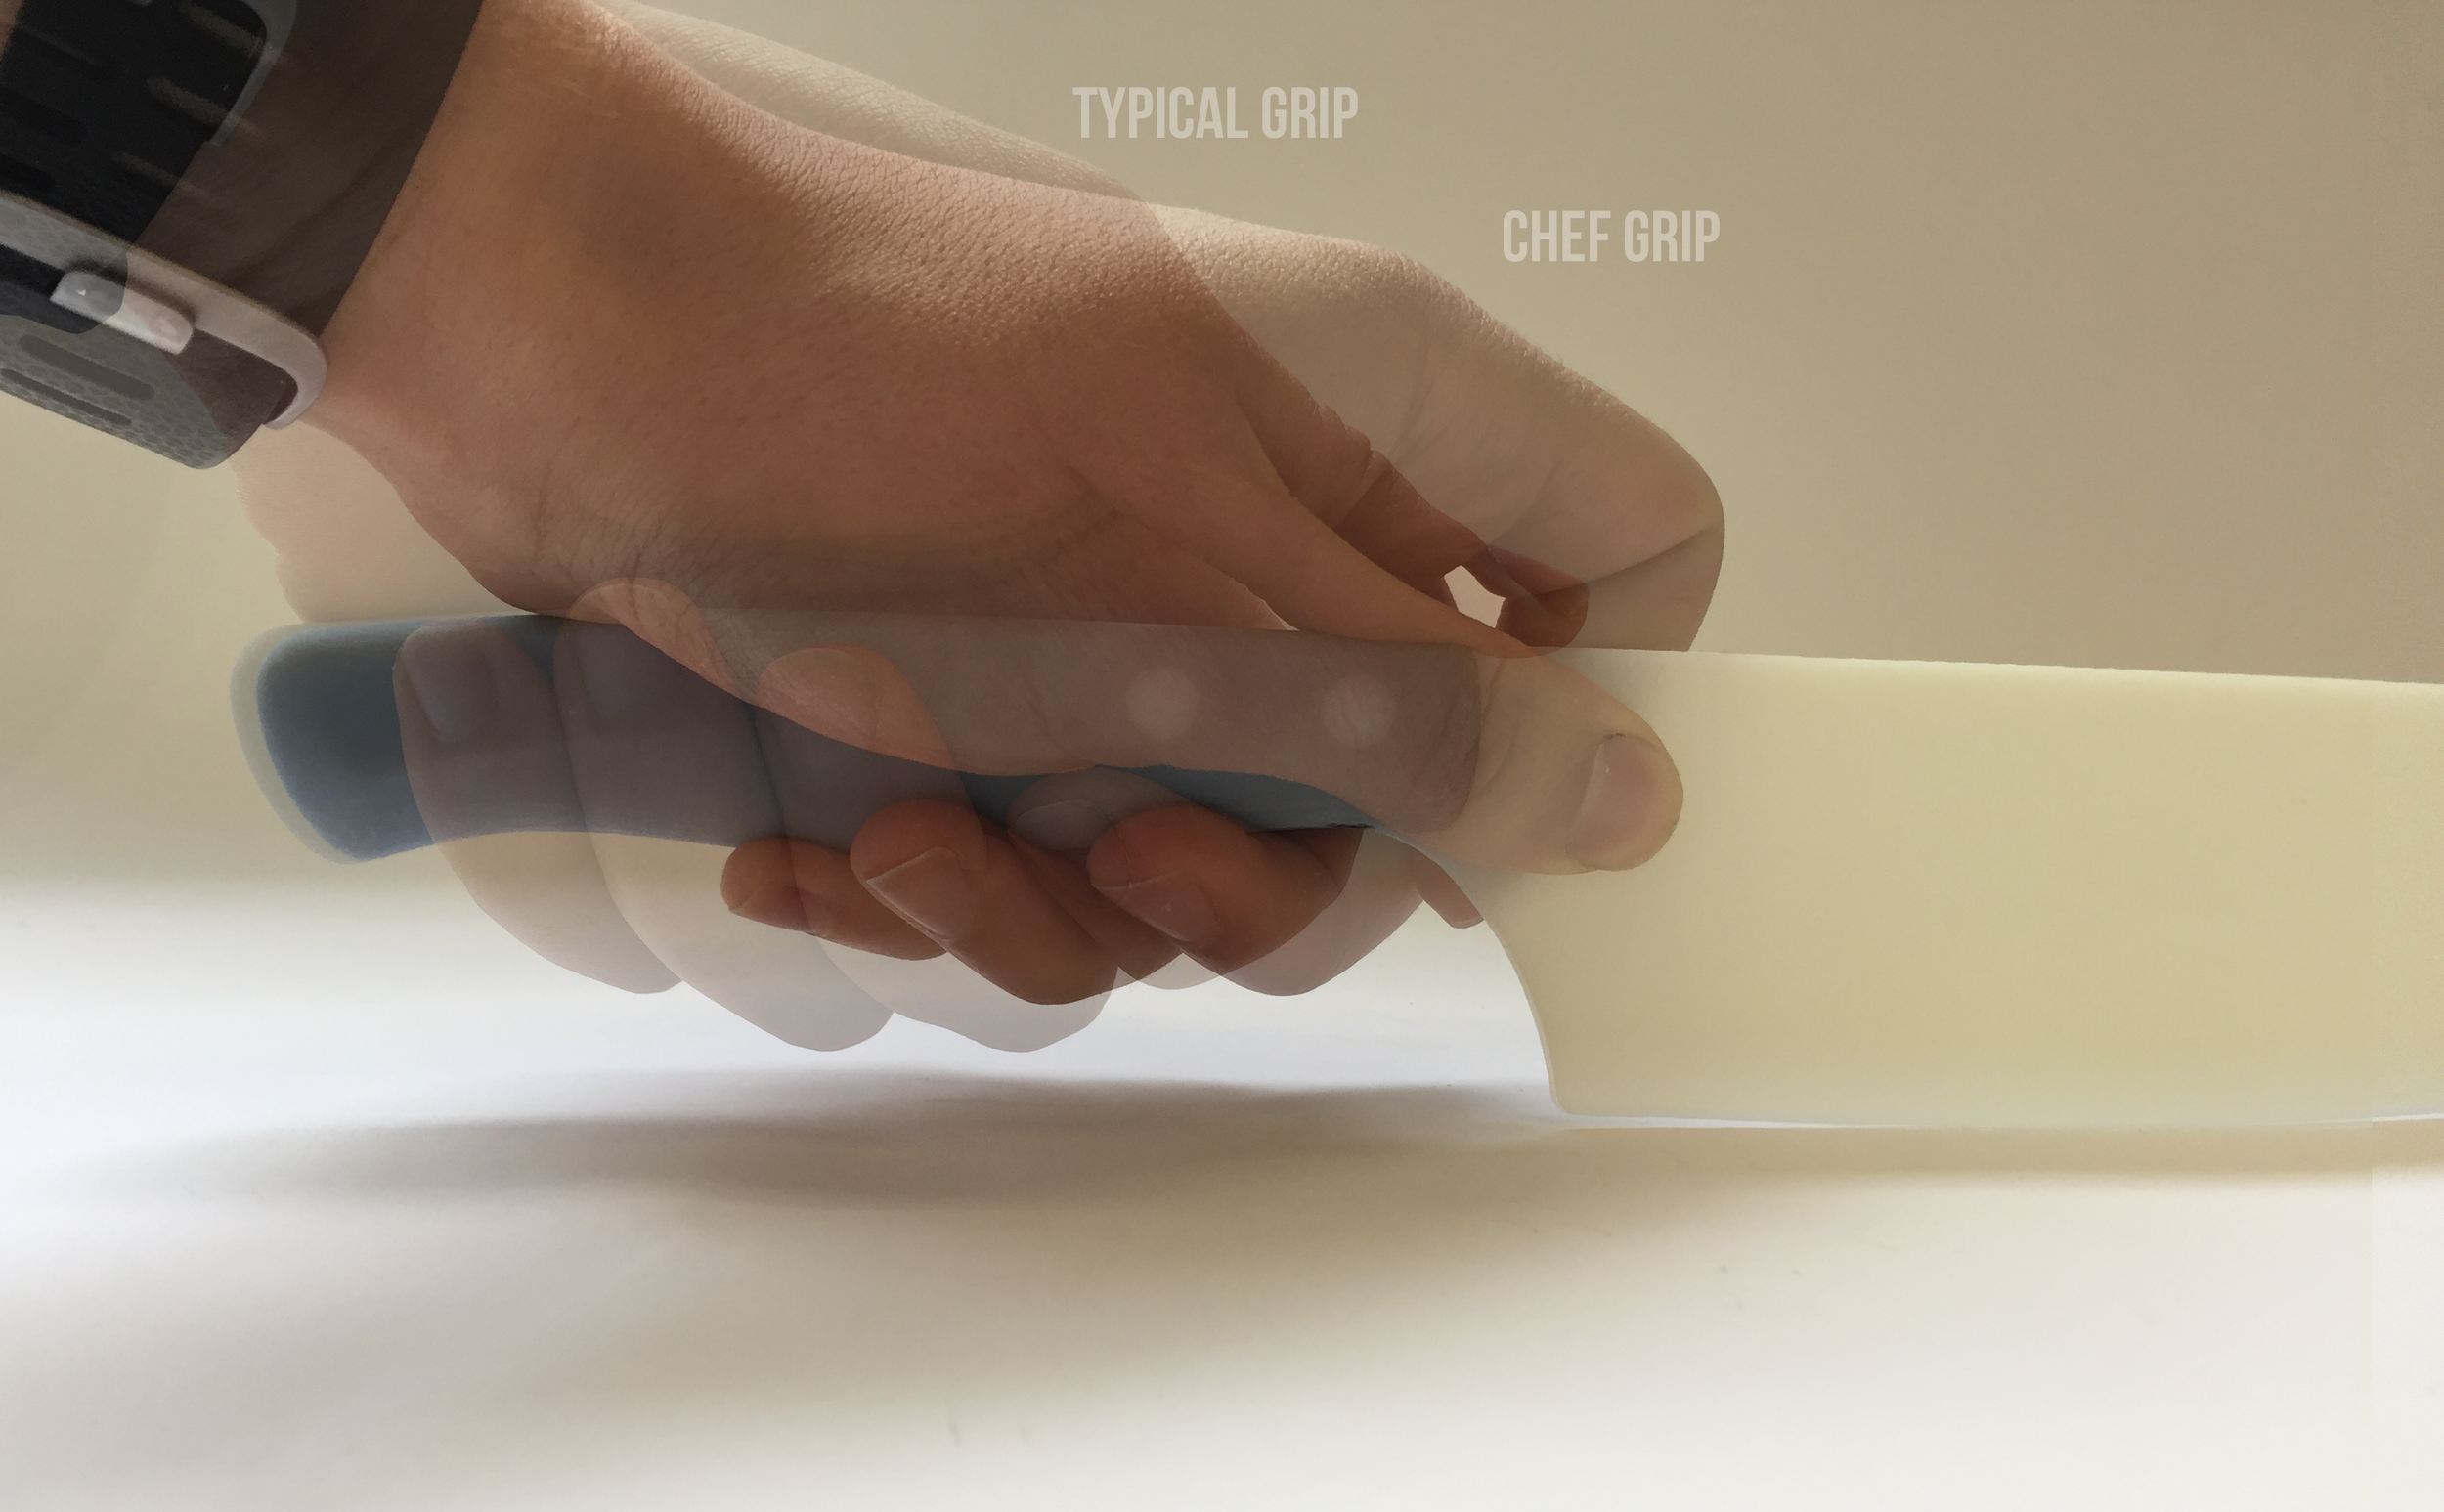 Chef-Grip_Typical-Grip_Comparison